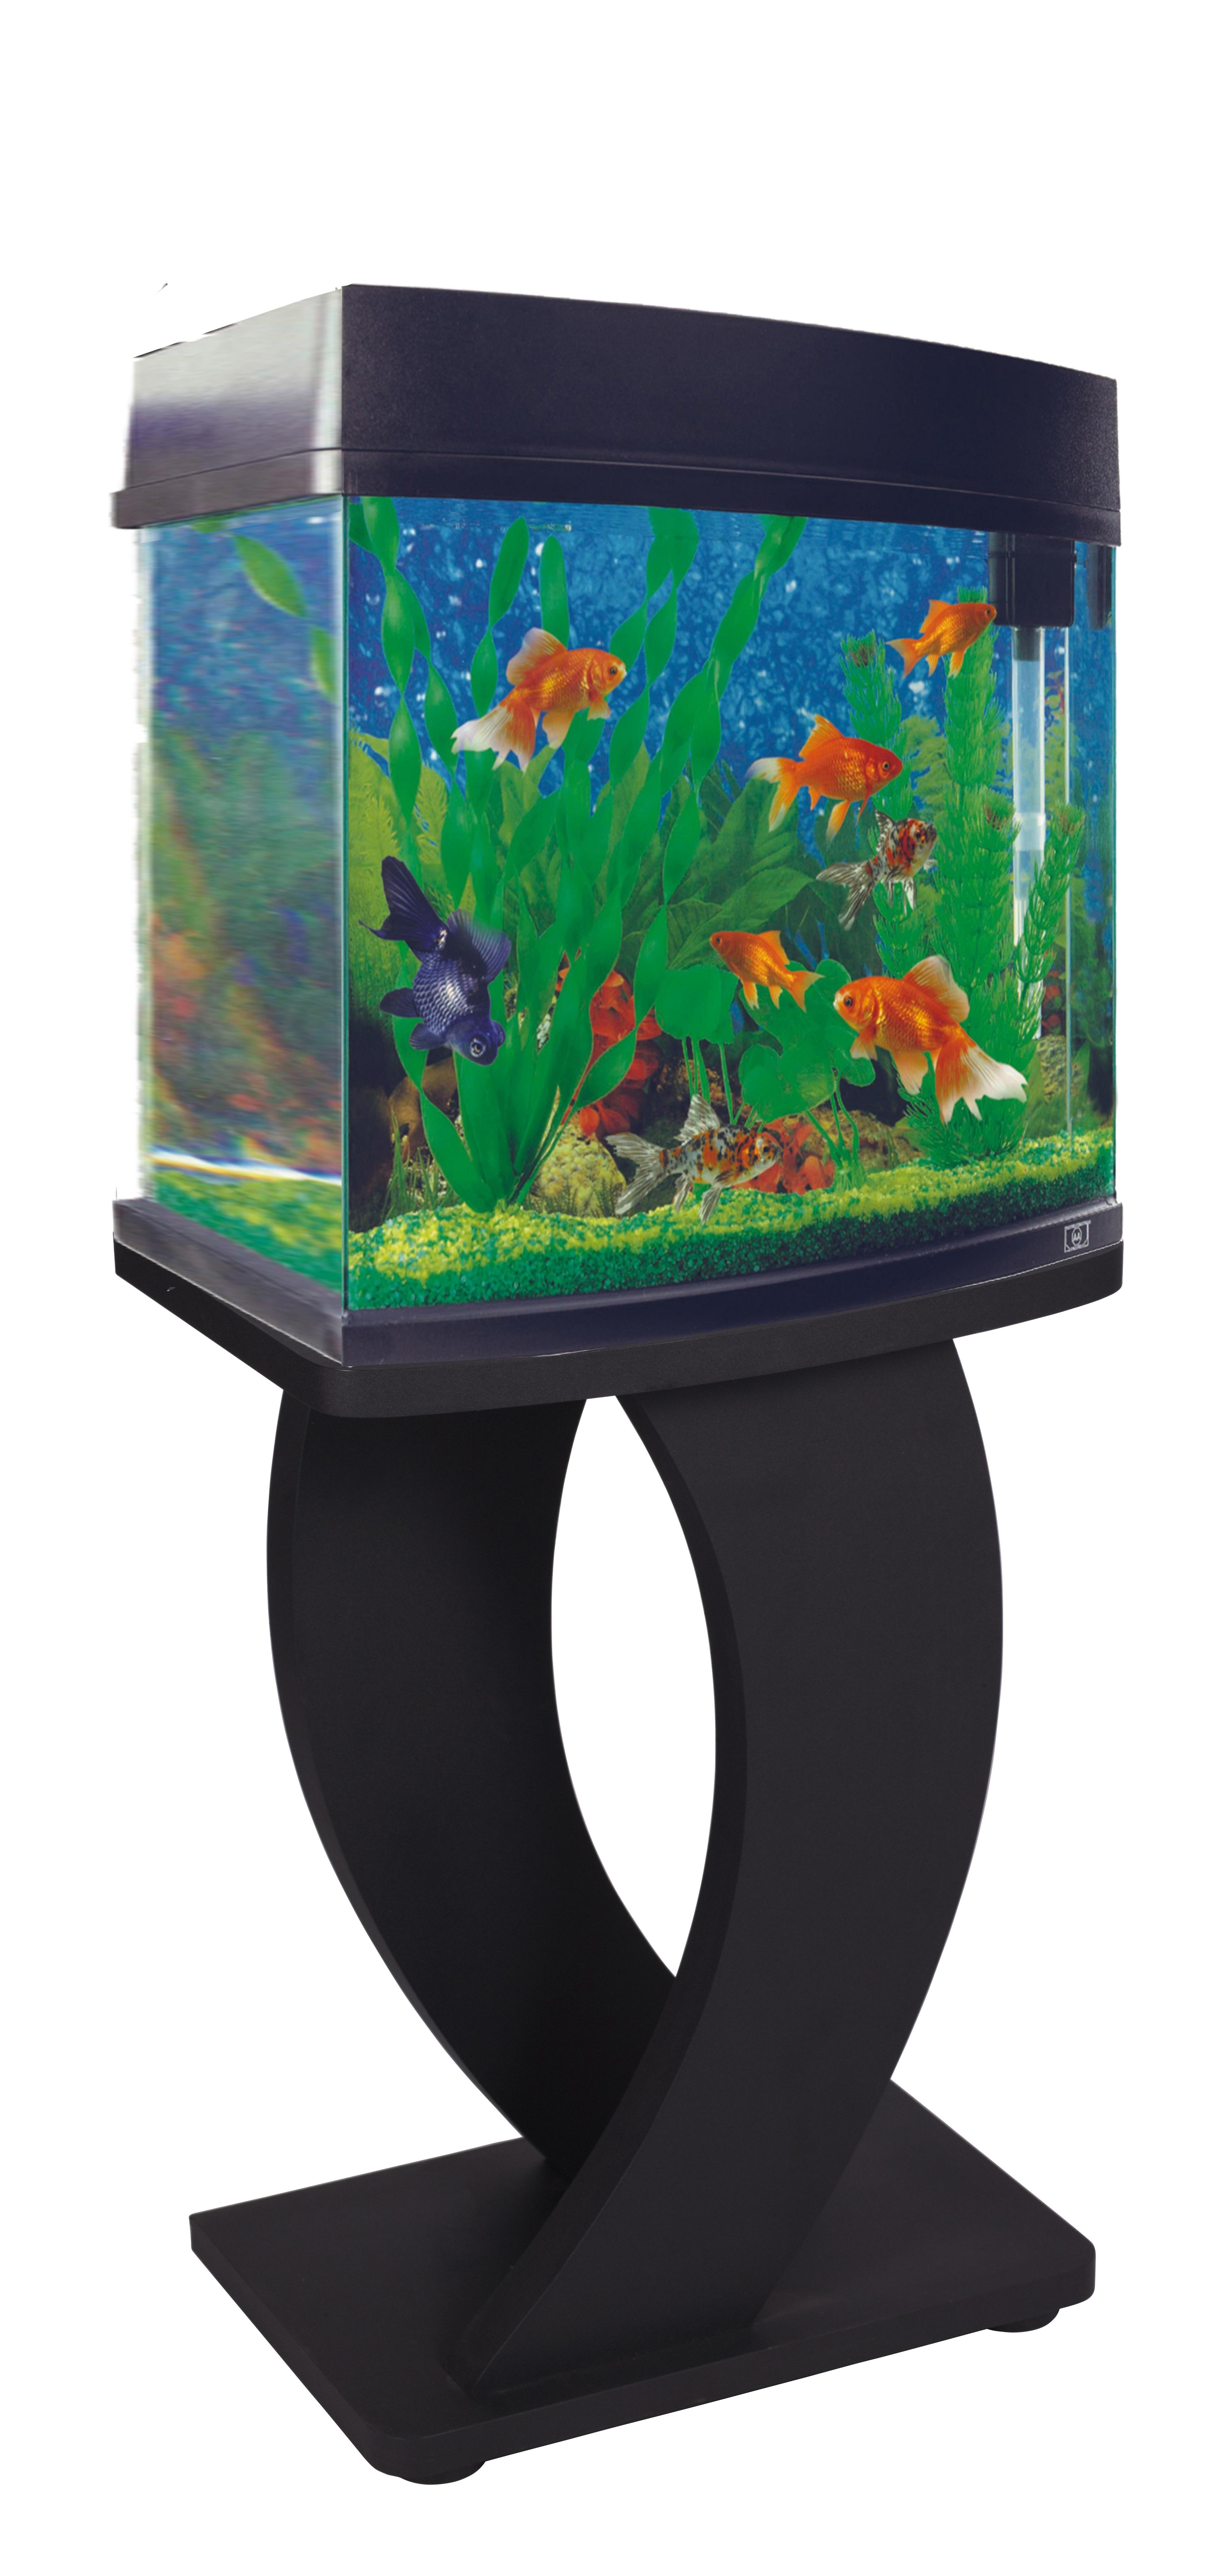 Wooden Mdf Aquarium Fish Tank Stand Black Silver Large